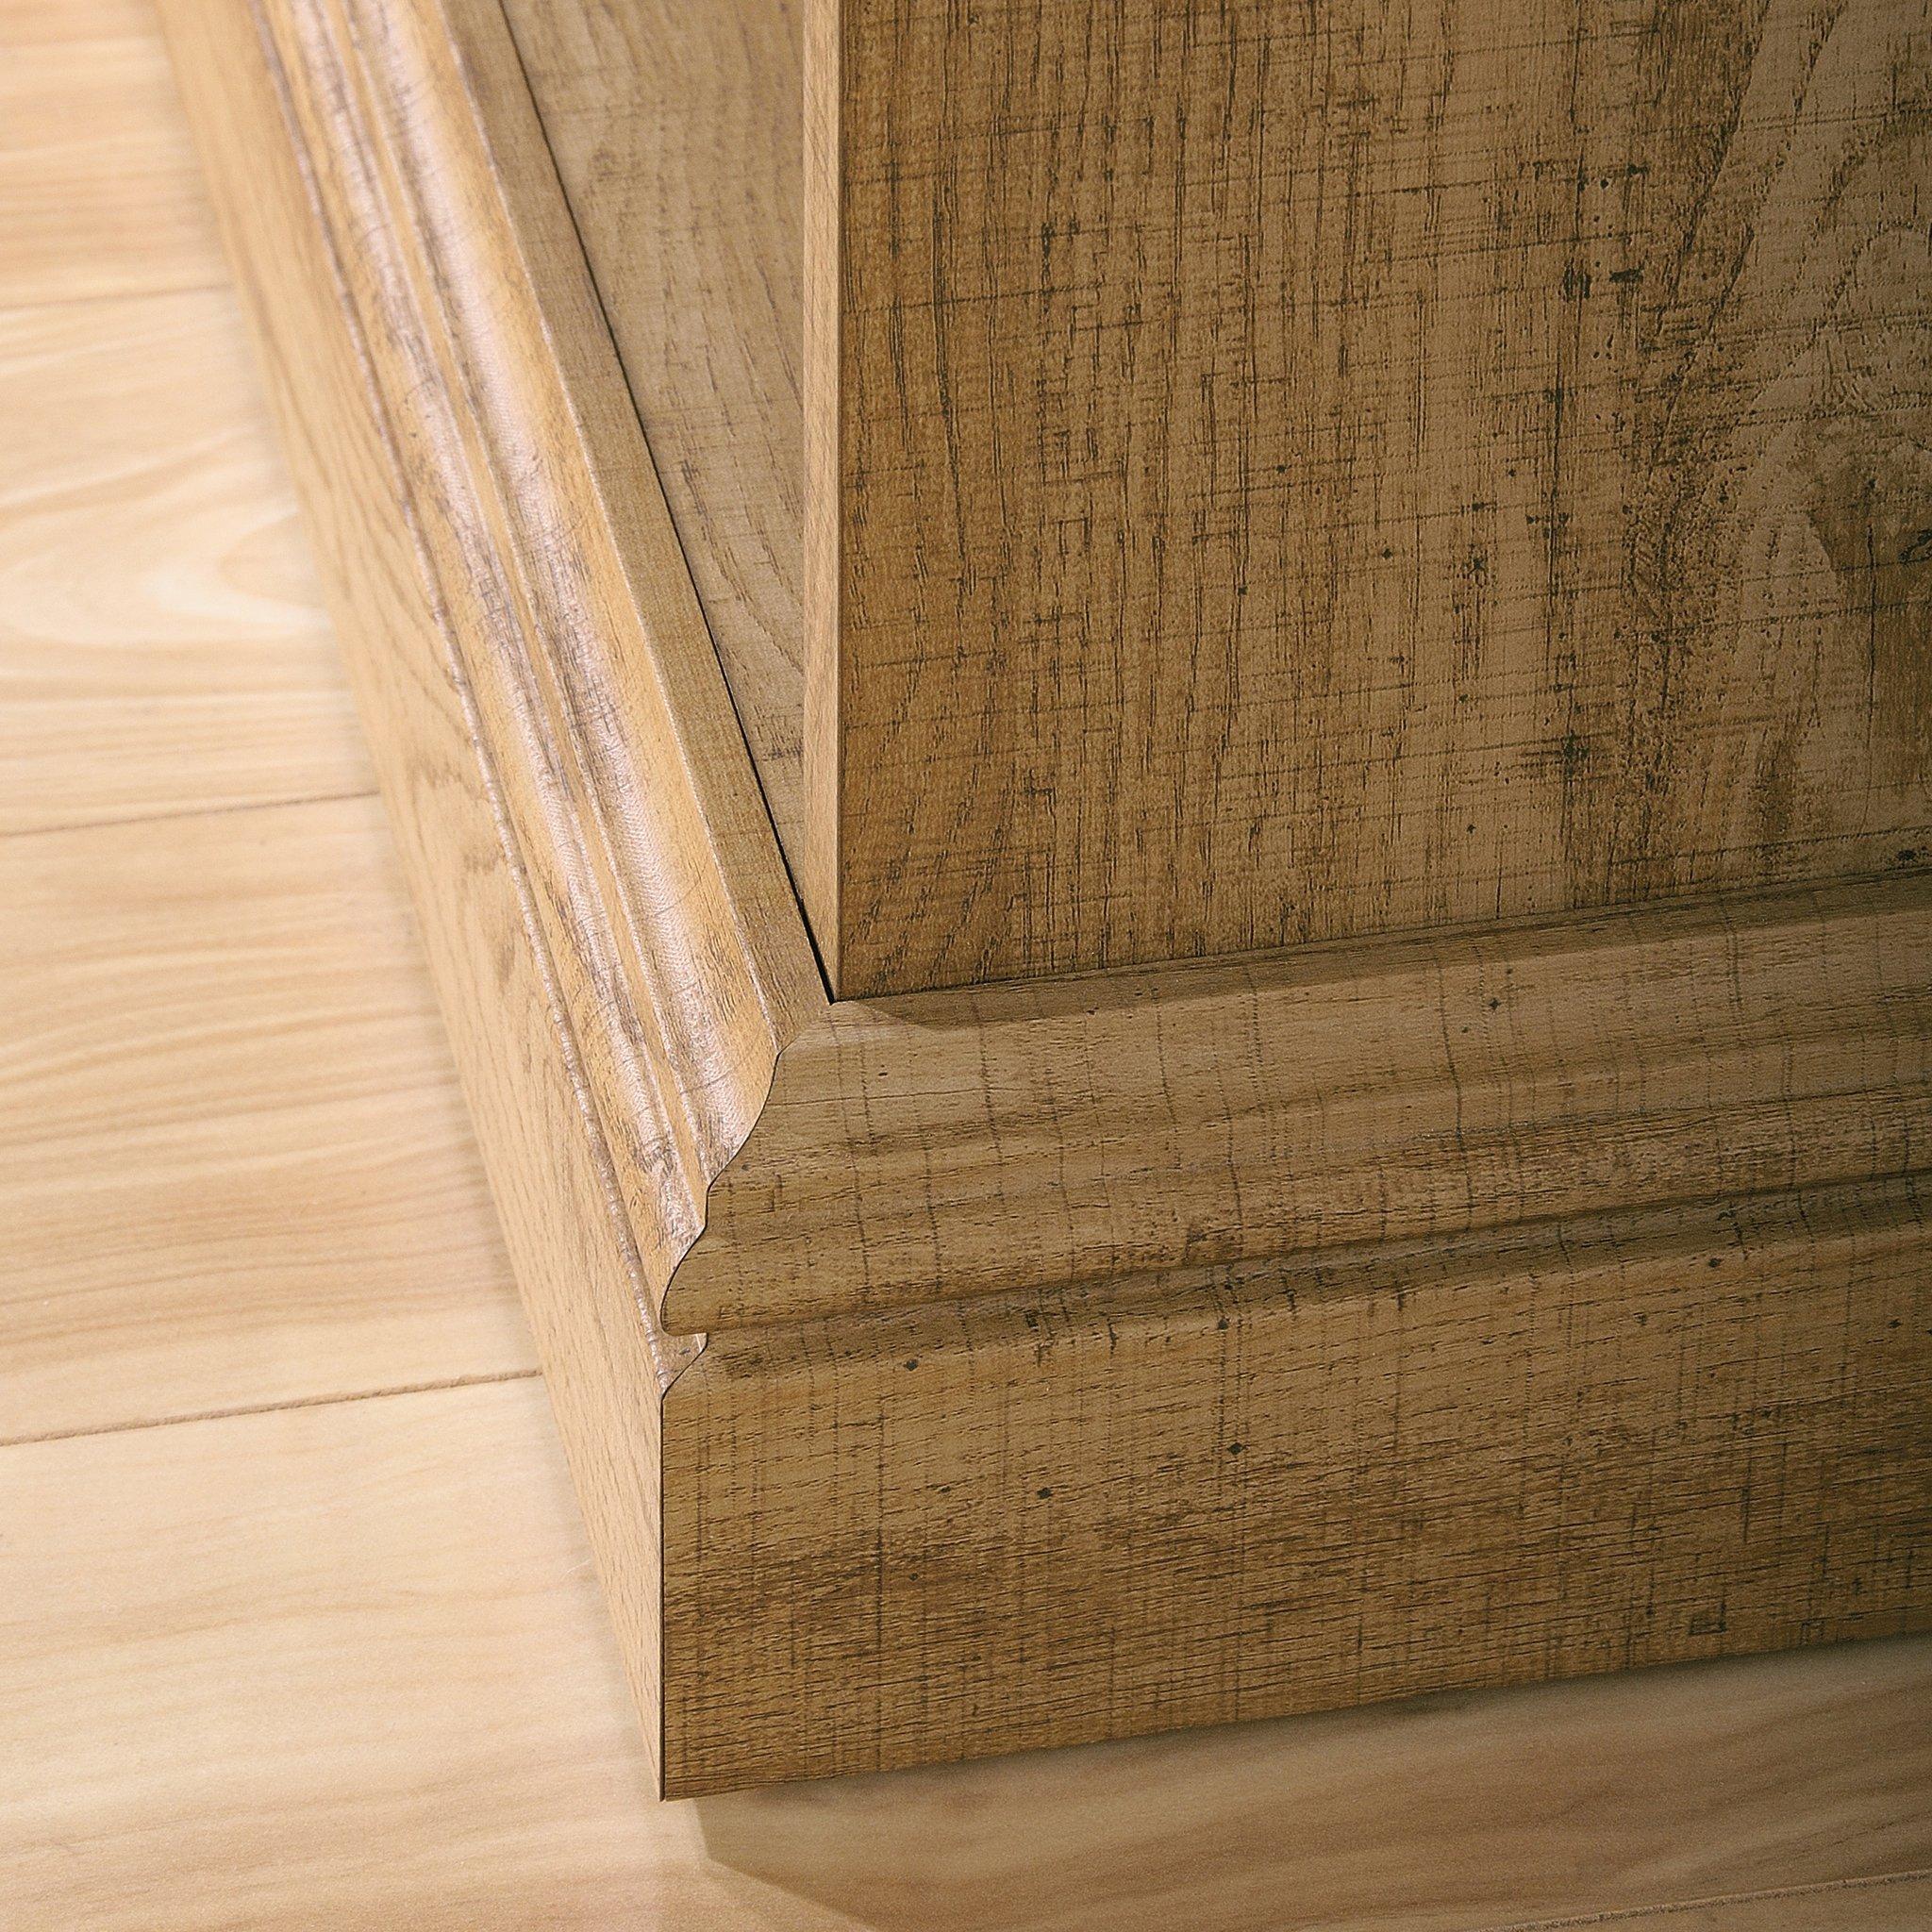 Sauder 414725 Barrister Lane Bookcase, L: 35.55'' x W: 13.50'' x H: 75.04'', Scribed Oak finish by Sauder (Image #9)